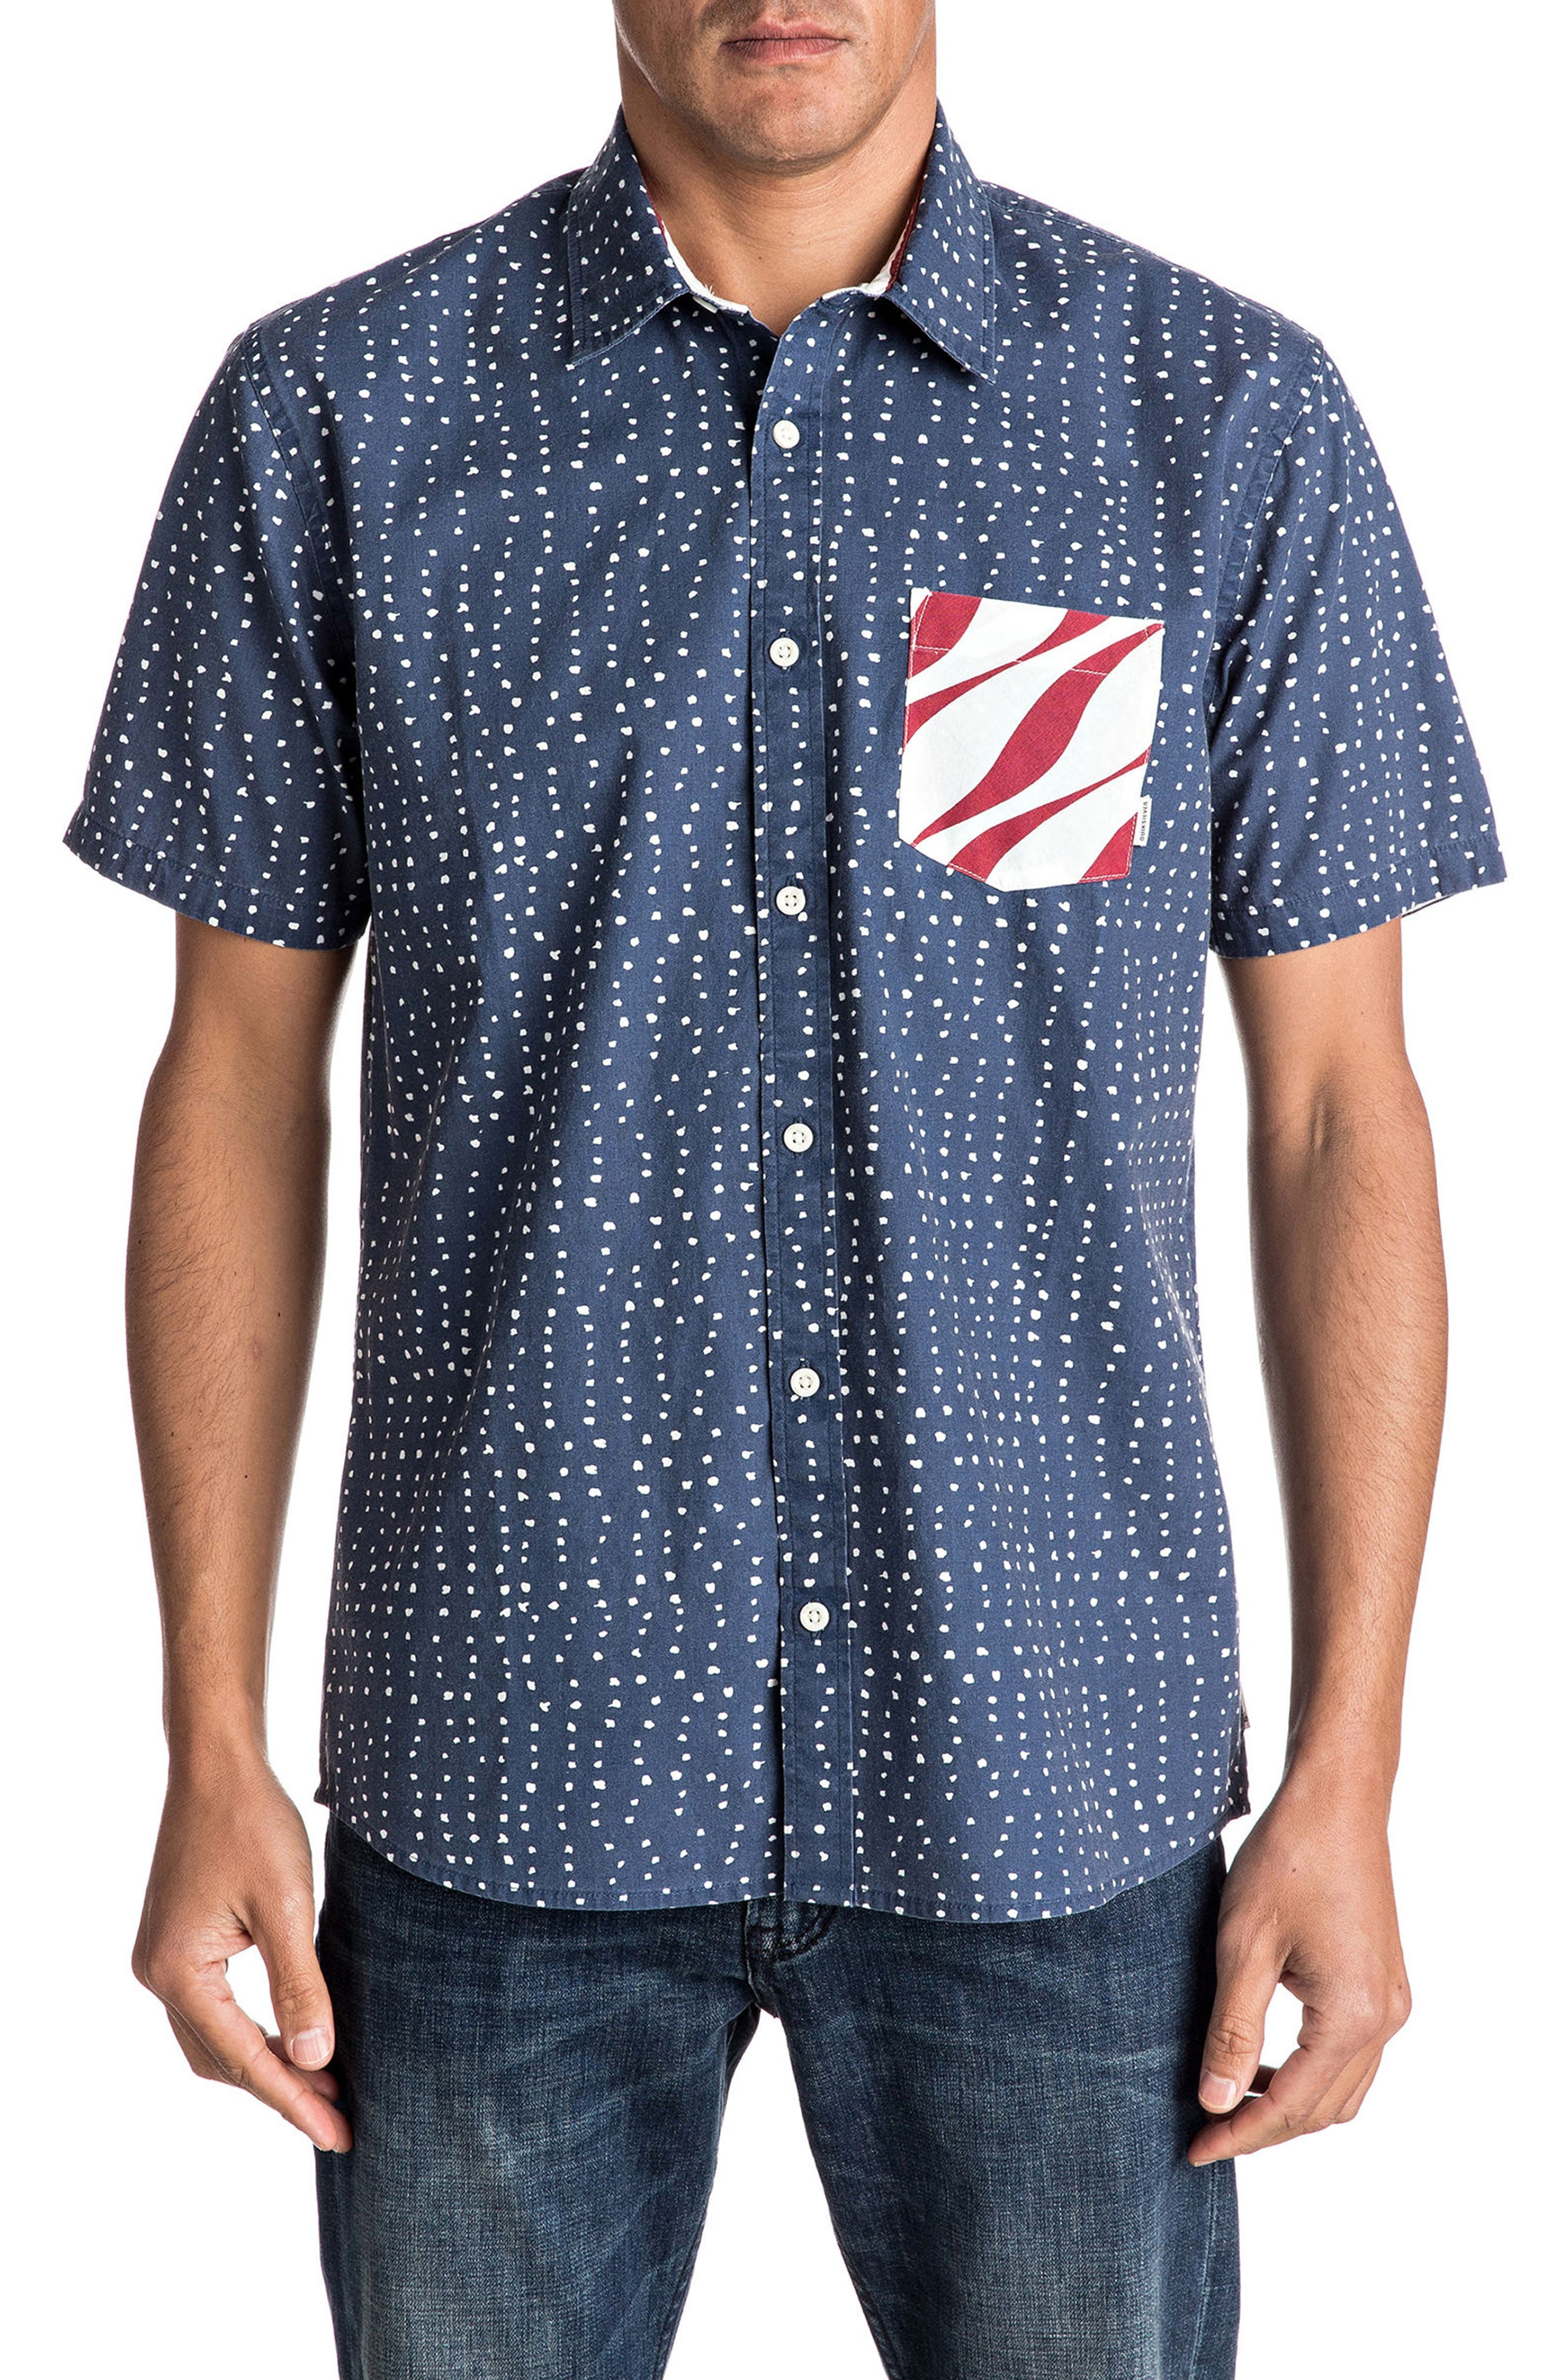 Quiksilver New Merica Print Shirt